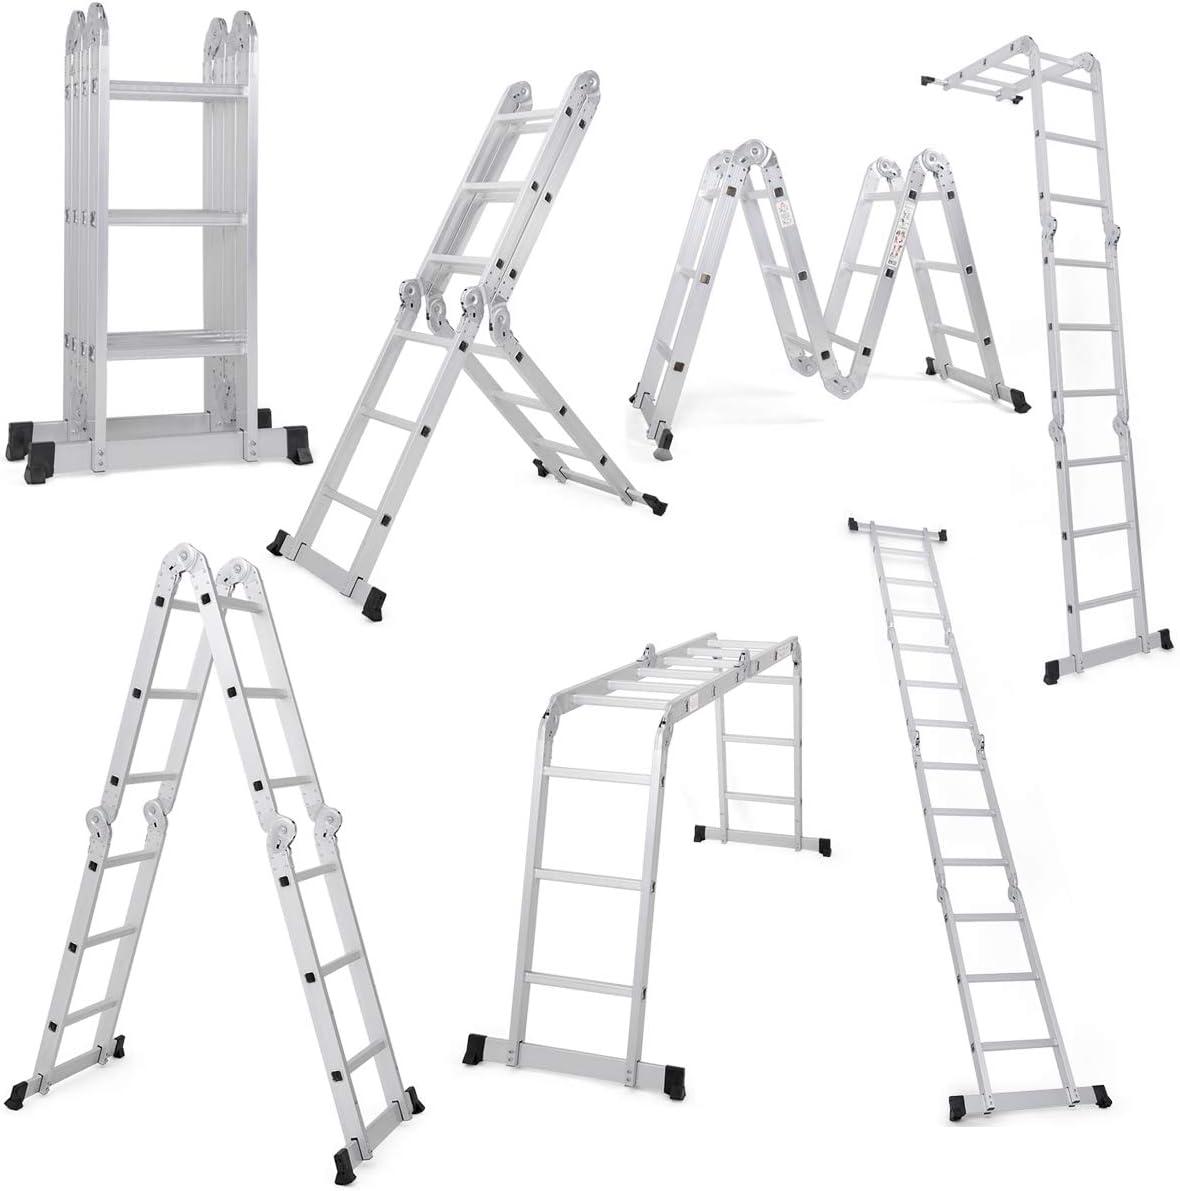 Giantex 12.5 Ft Multi Purpose Folding Step Ladder Platform Extendable Scaffold Ladder EN131 Aluminum 7 in 1 Extension Step Lightweight 330LB (12.5 Ft)